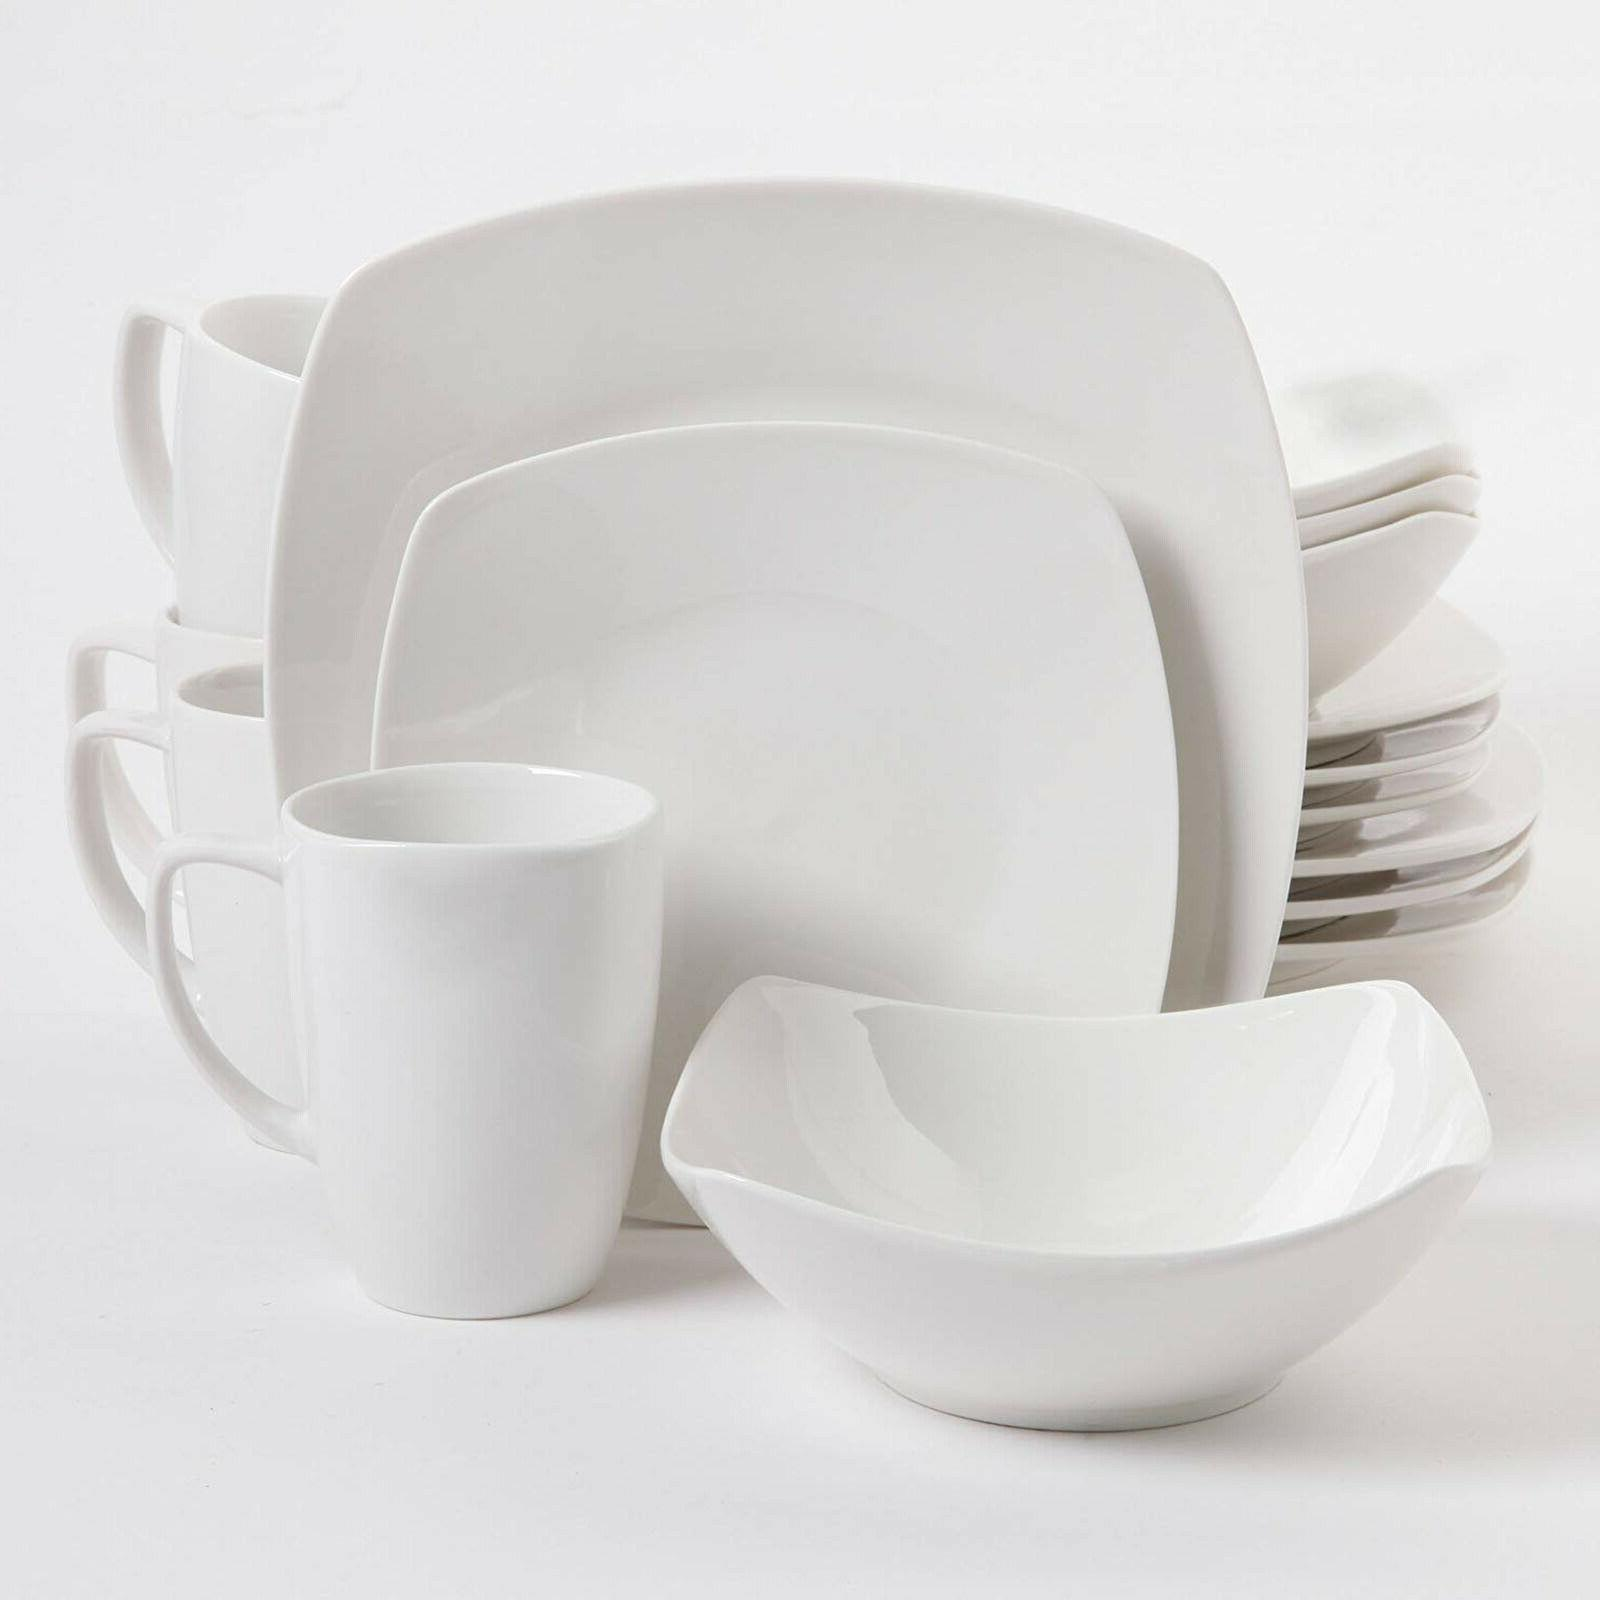 16 Porcelain Set White Plates Service 4